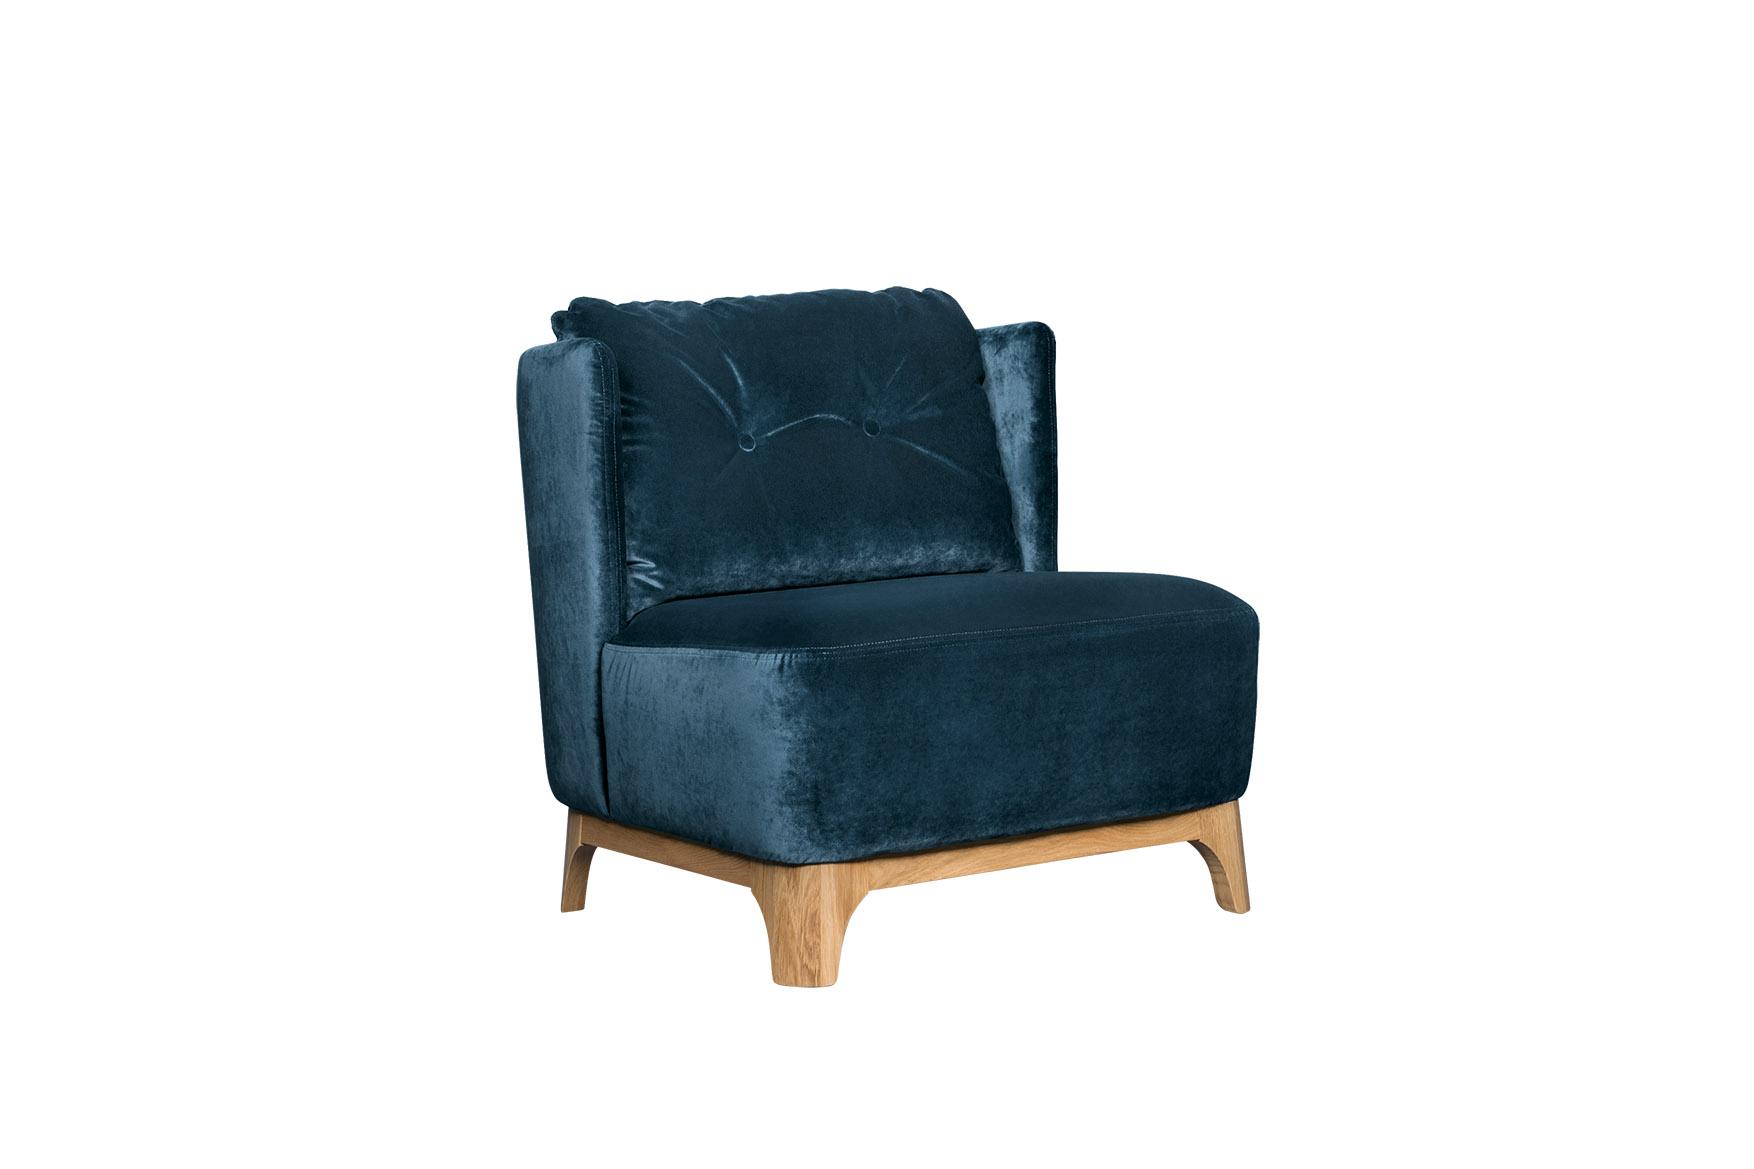 ALMA_armchair_buttons_classic_velvet12_navy_blue_2